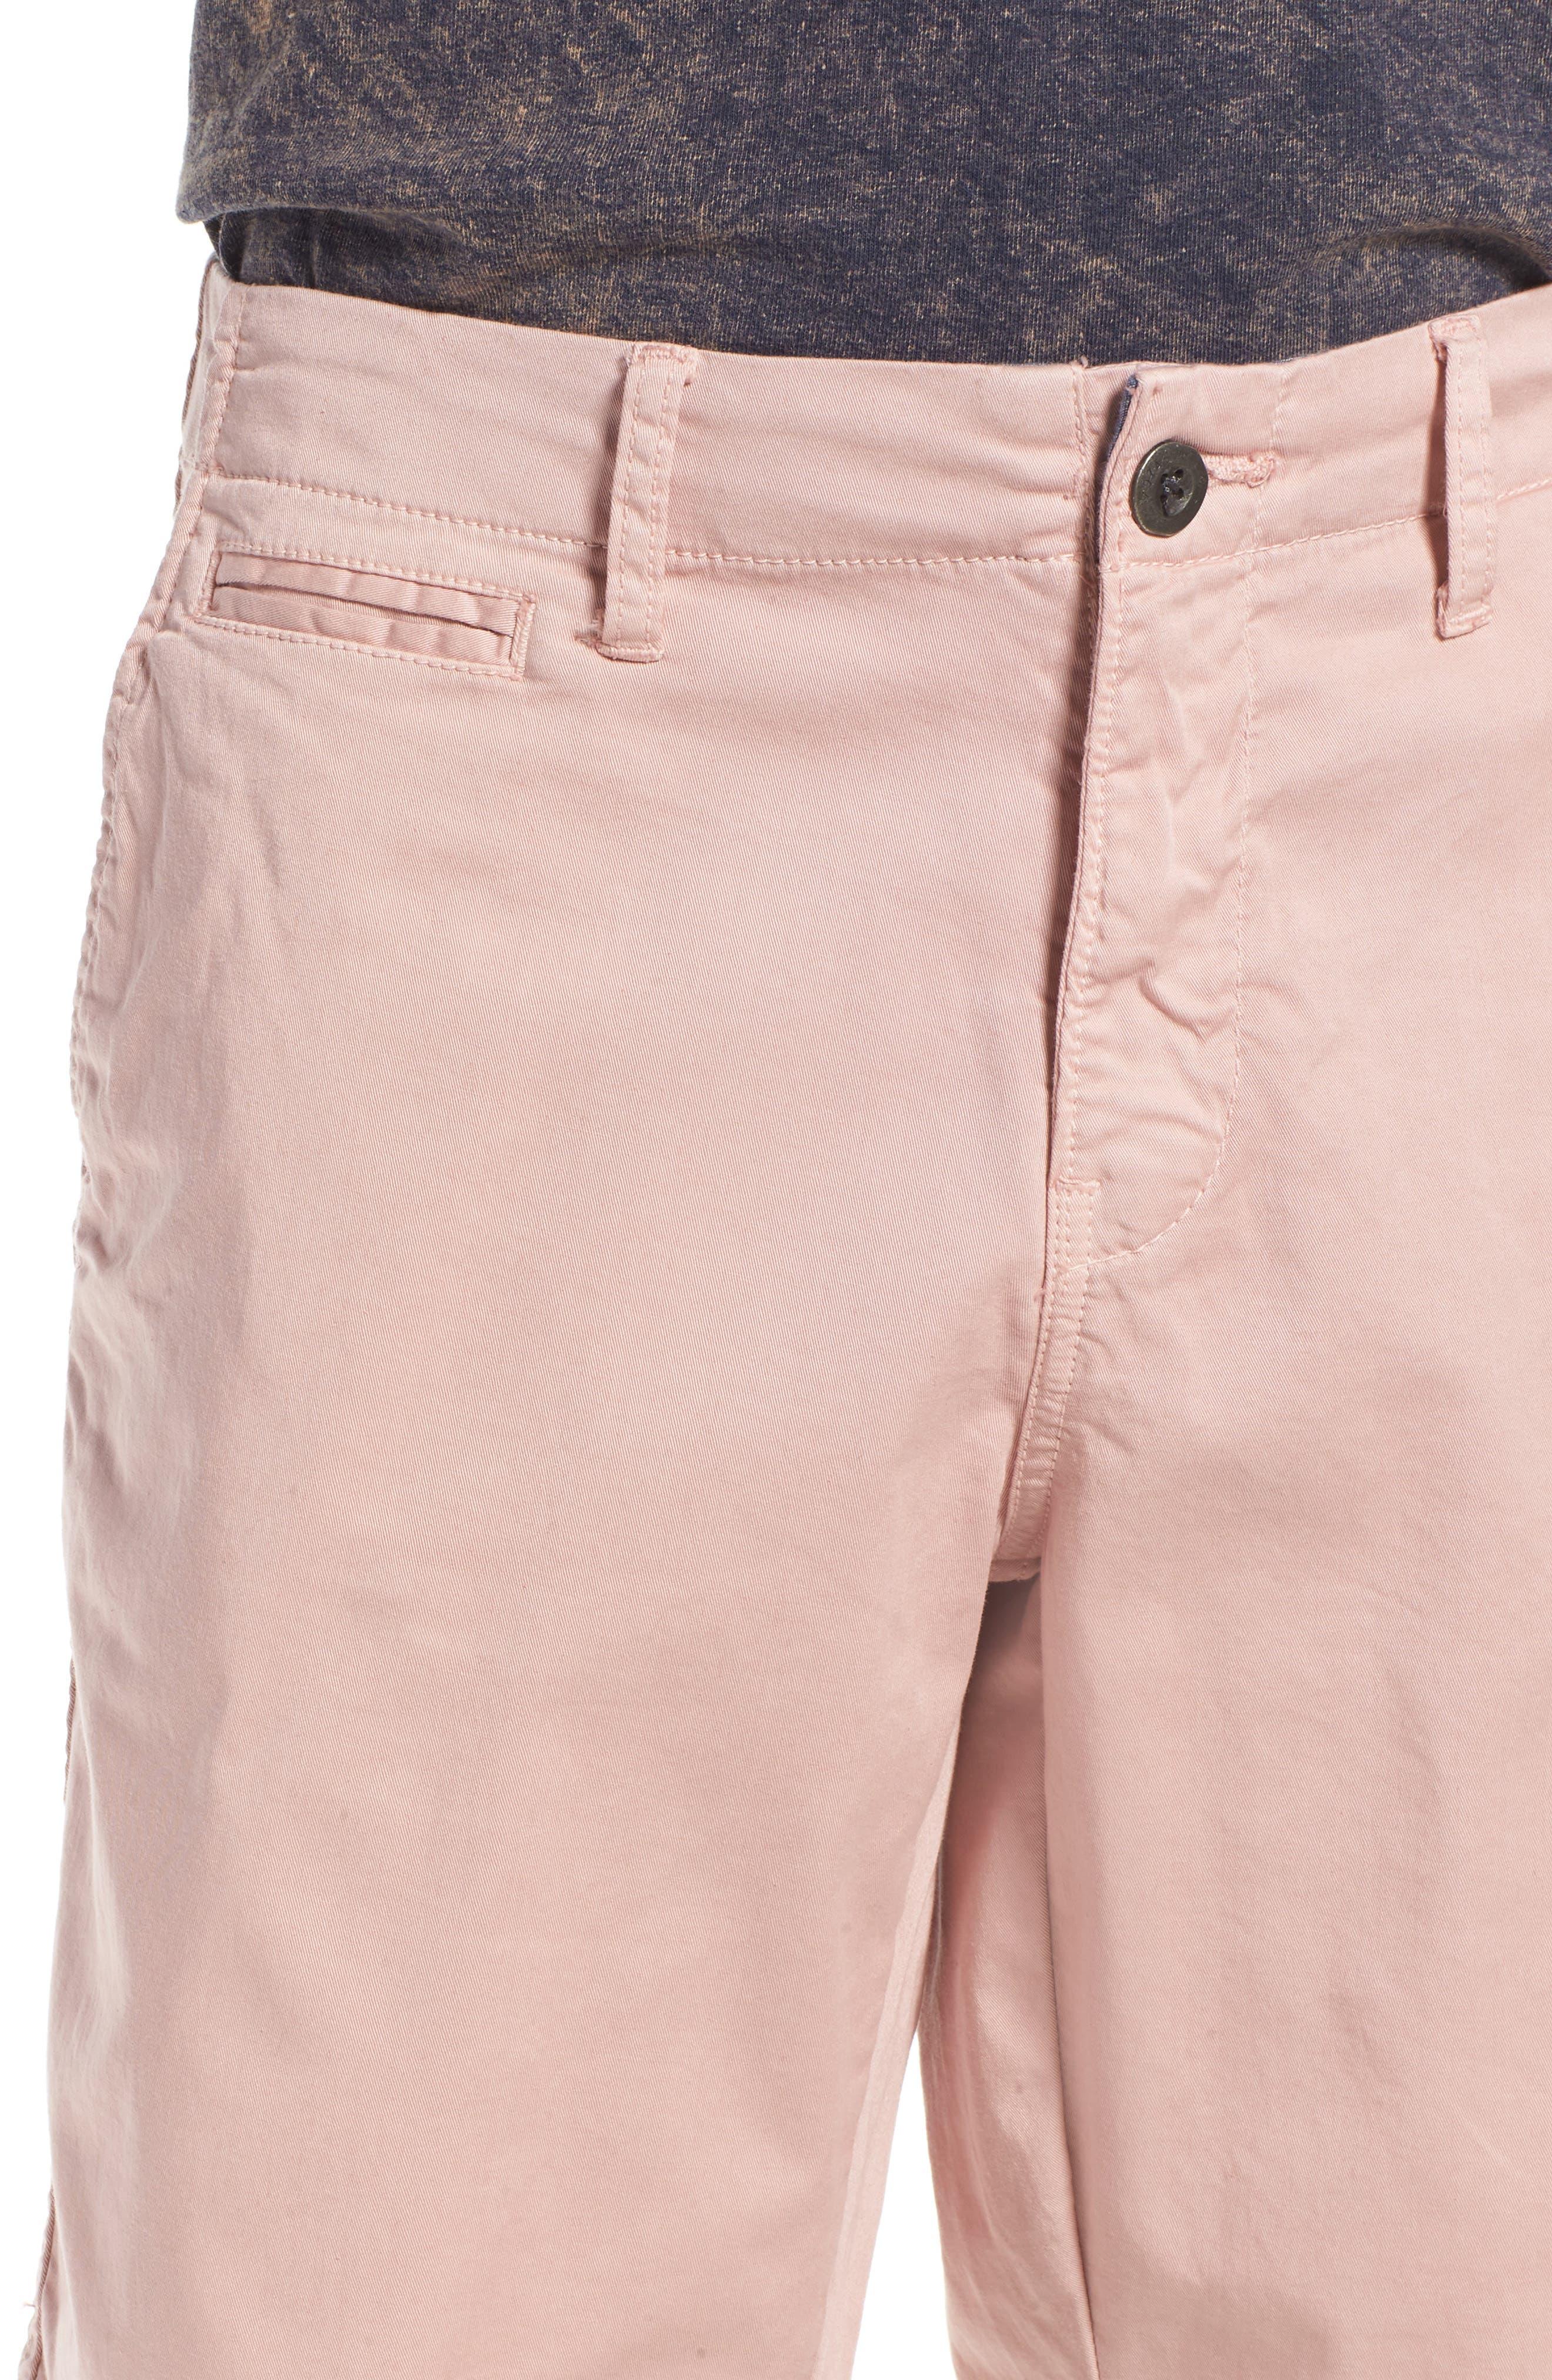 St. Barts Twill Shorts,                             Alternate thumbnail 47, color,